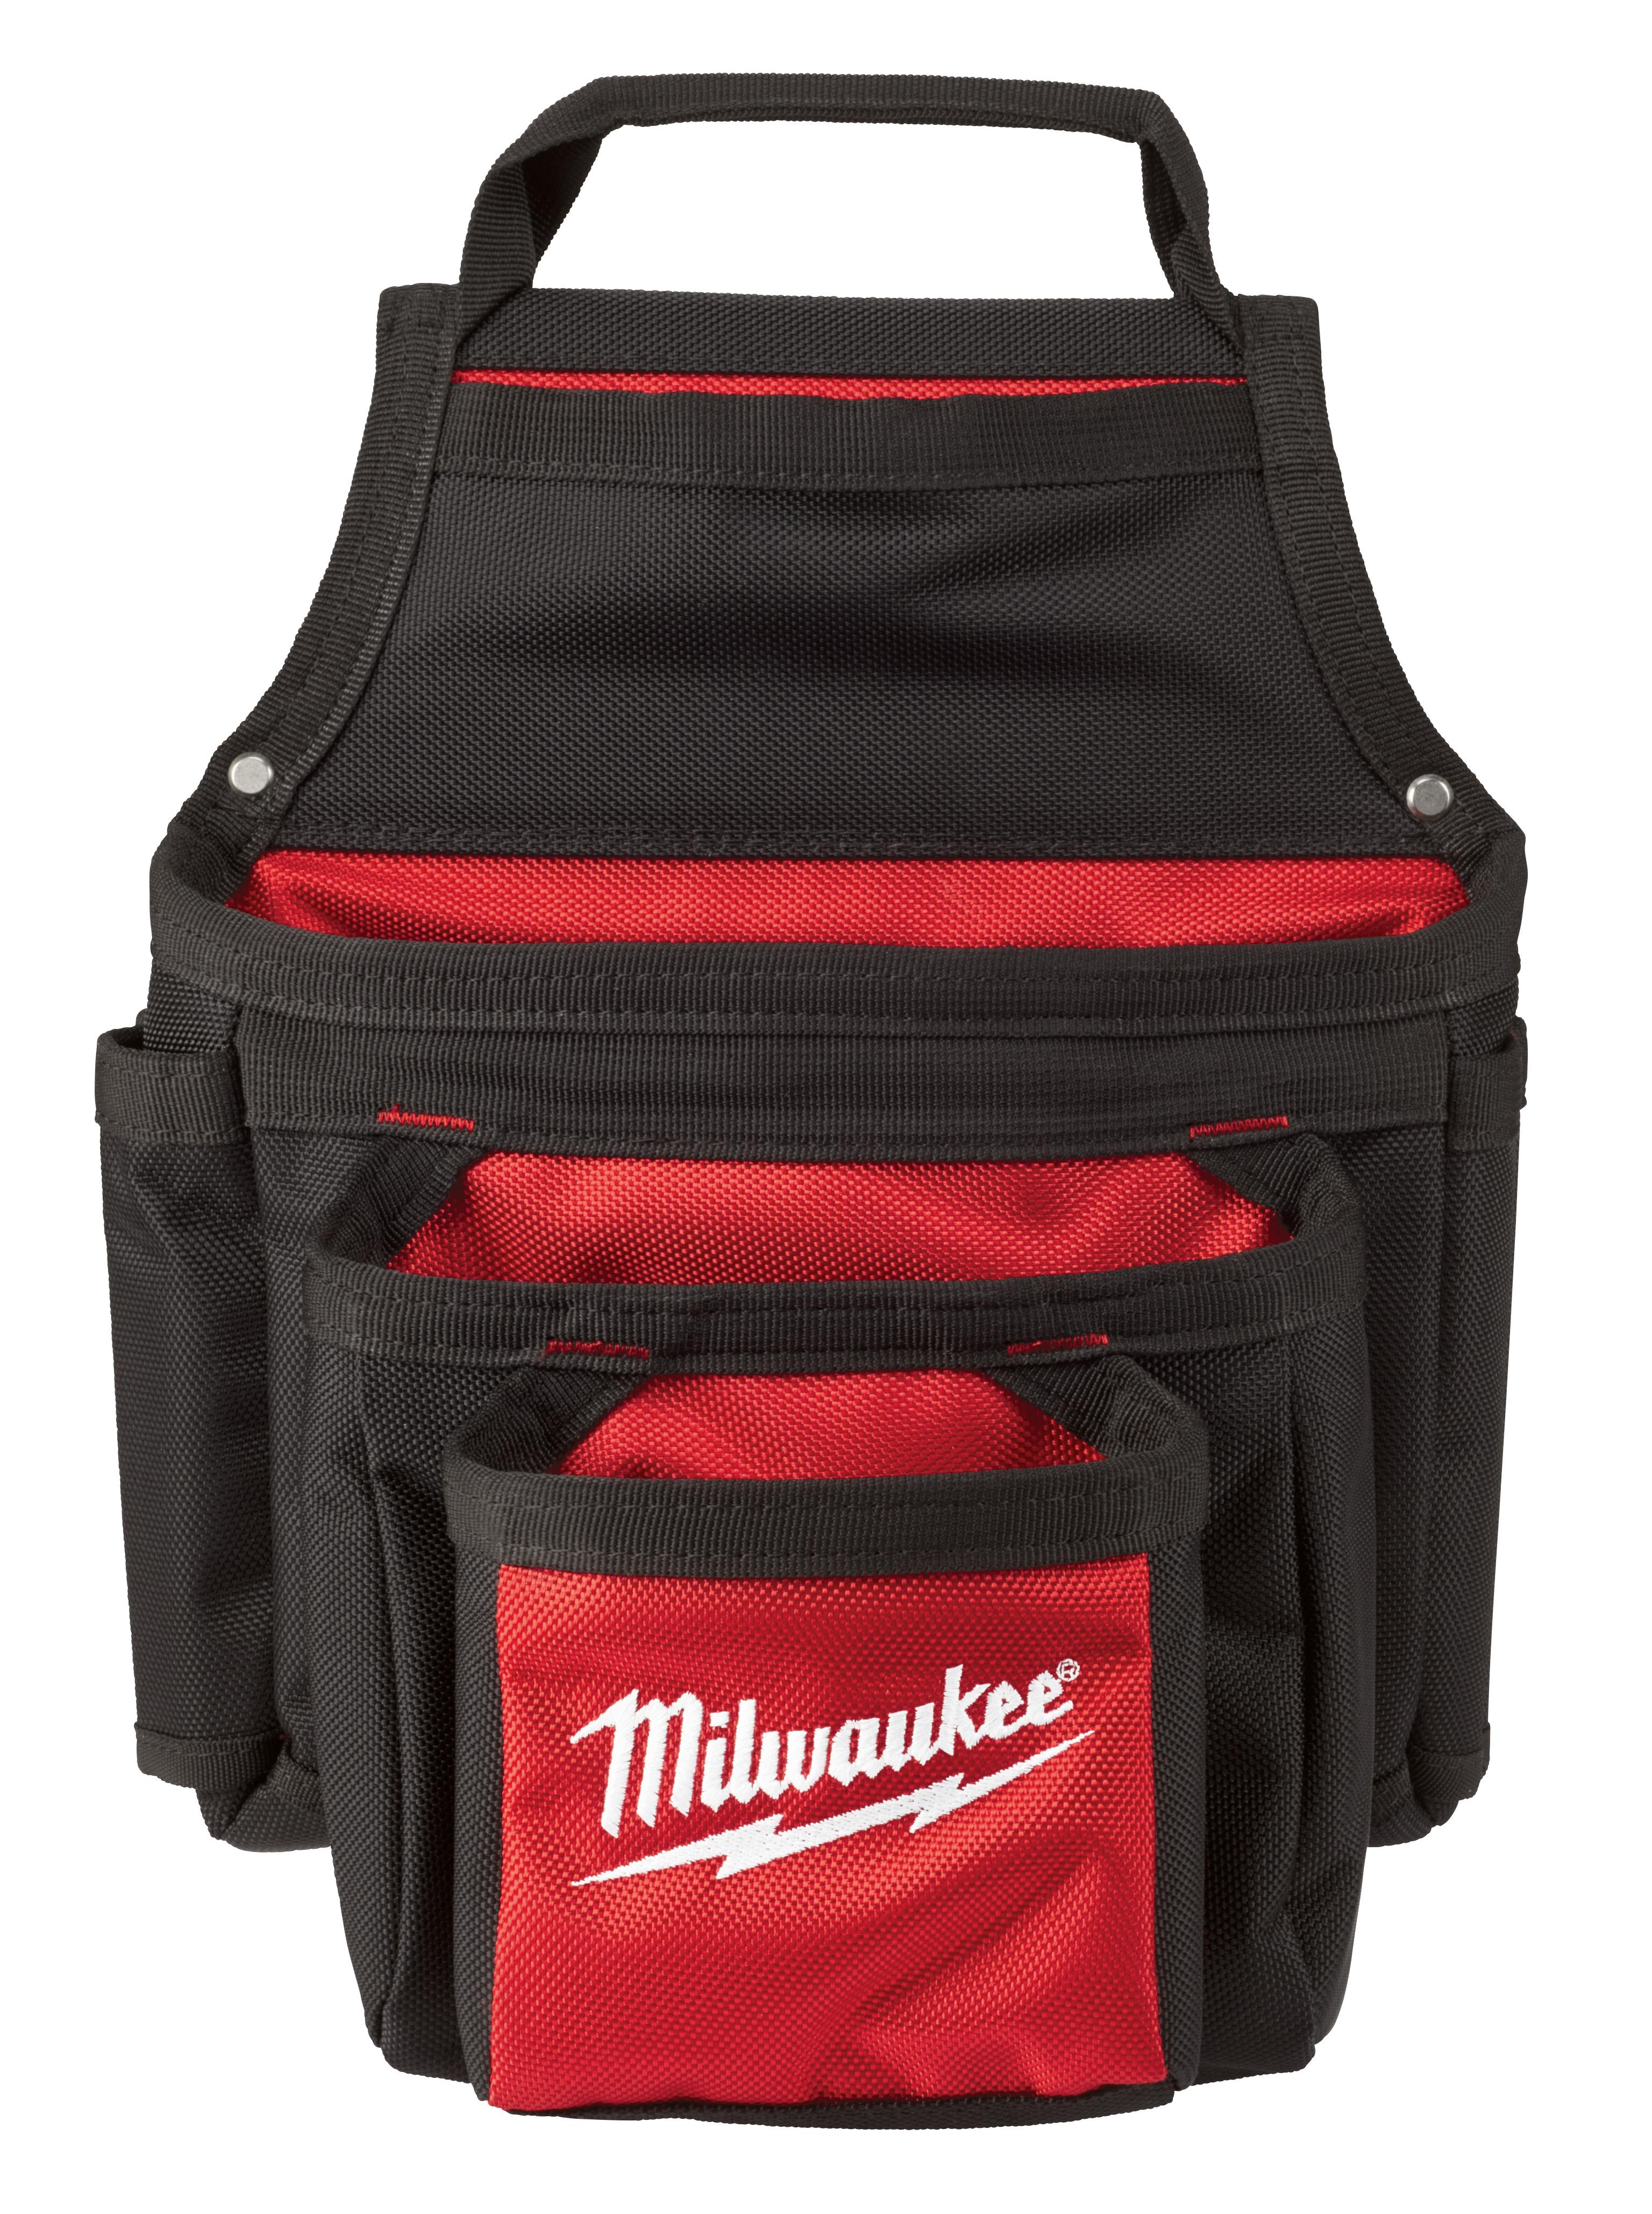 Milwaukee® 48-22-8122 Pouch, Ballistic Nylon, Black/Red